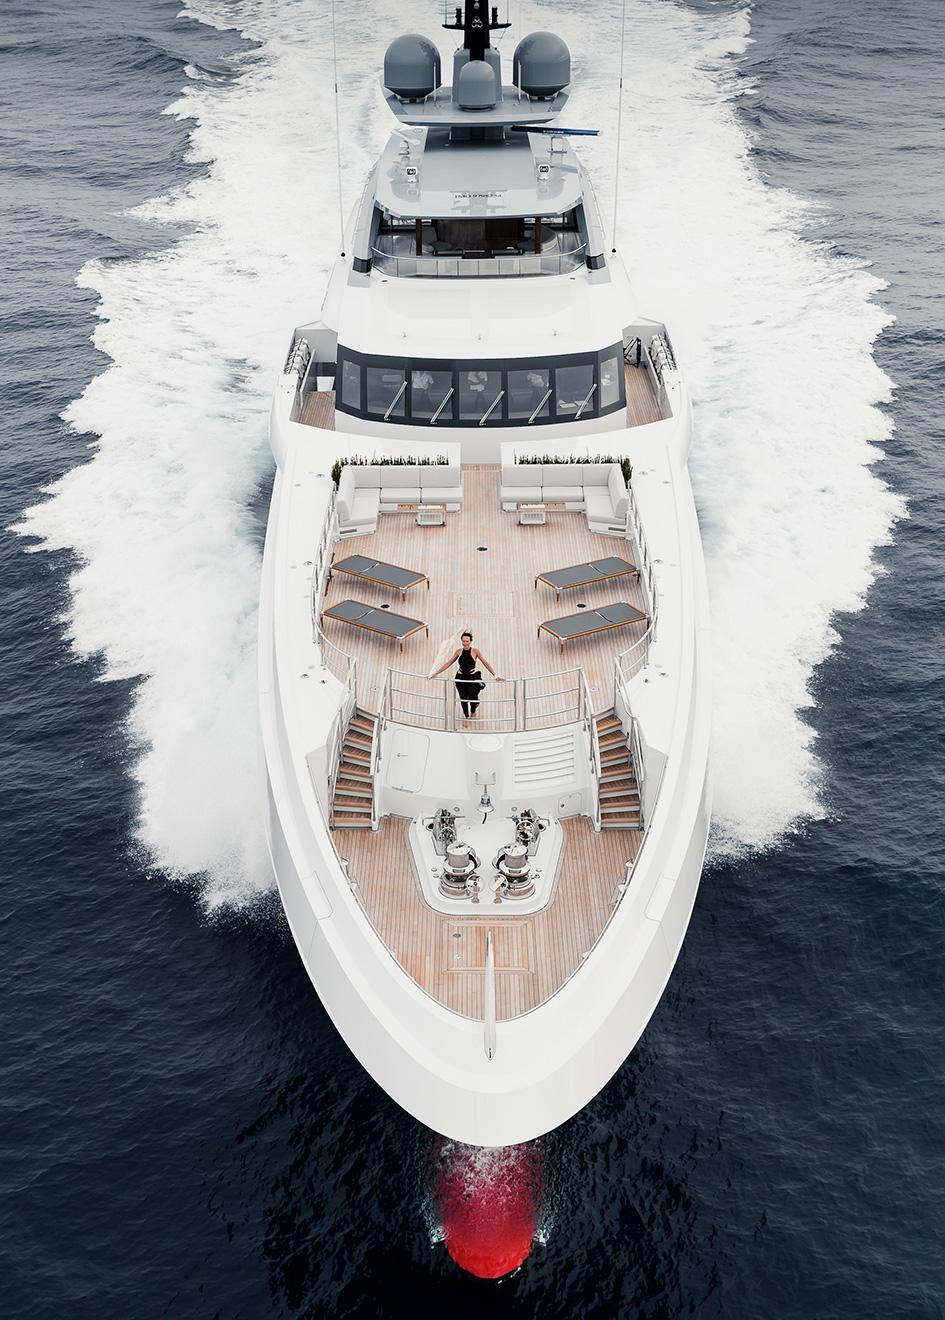 heesen-flagship-yacht-galactica-super-nova-is-capable-of-more-than-30-knots